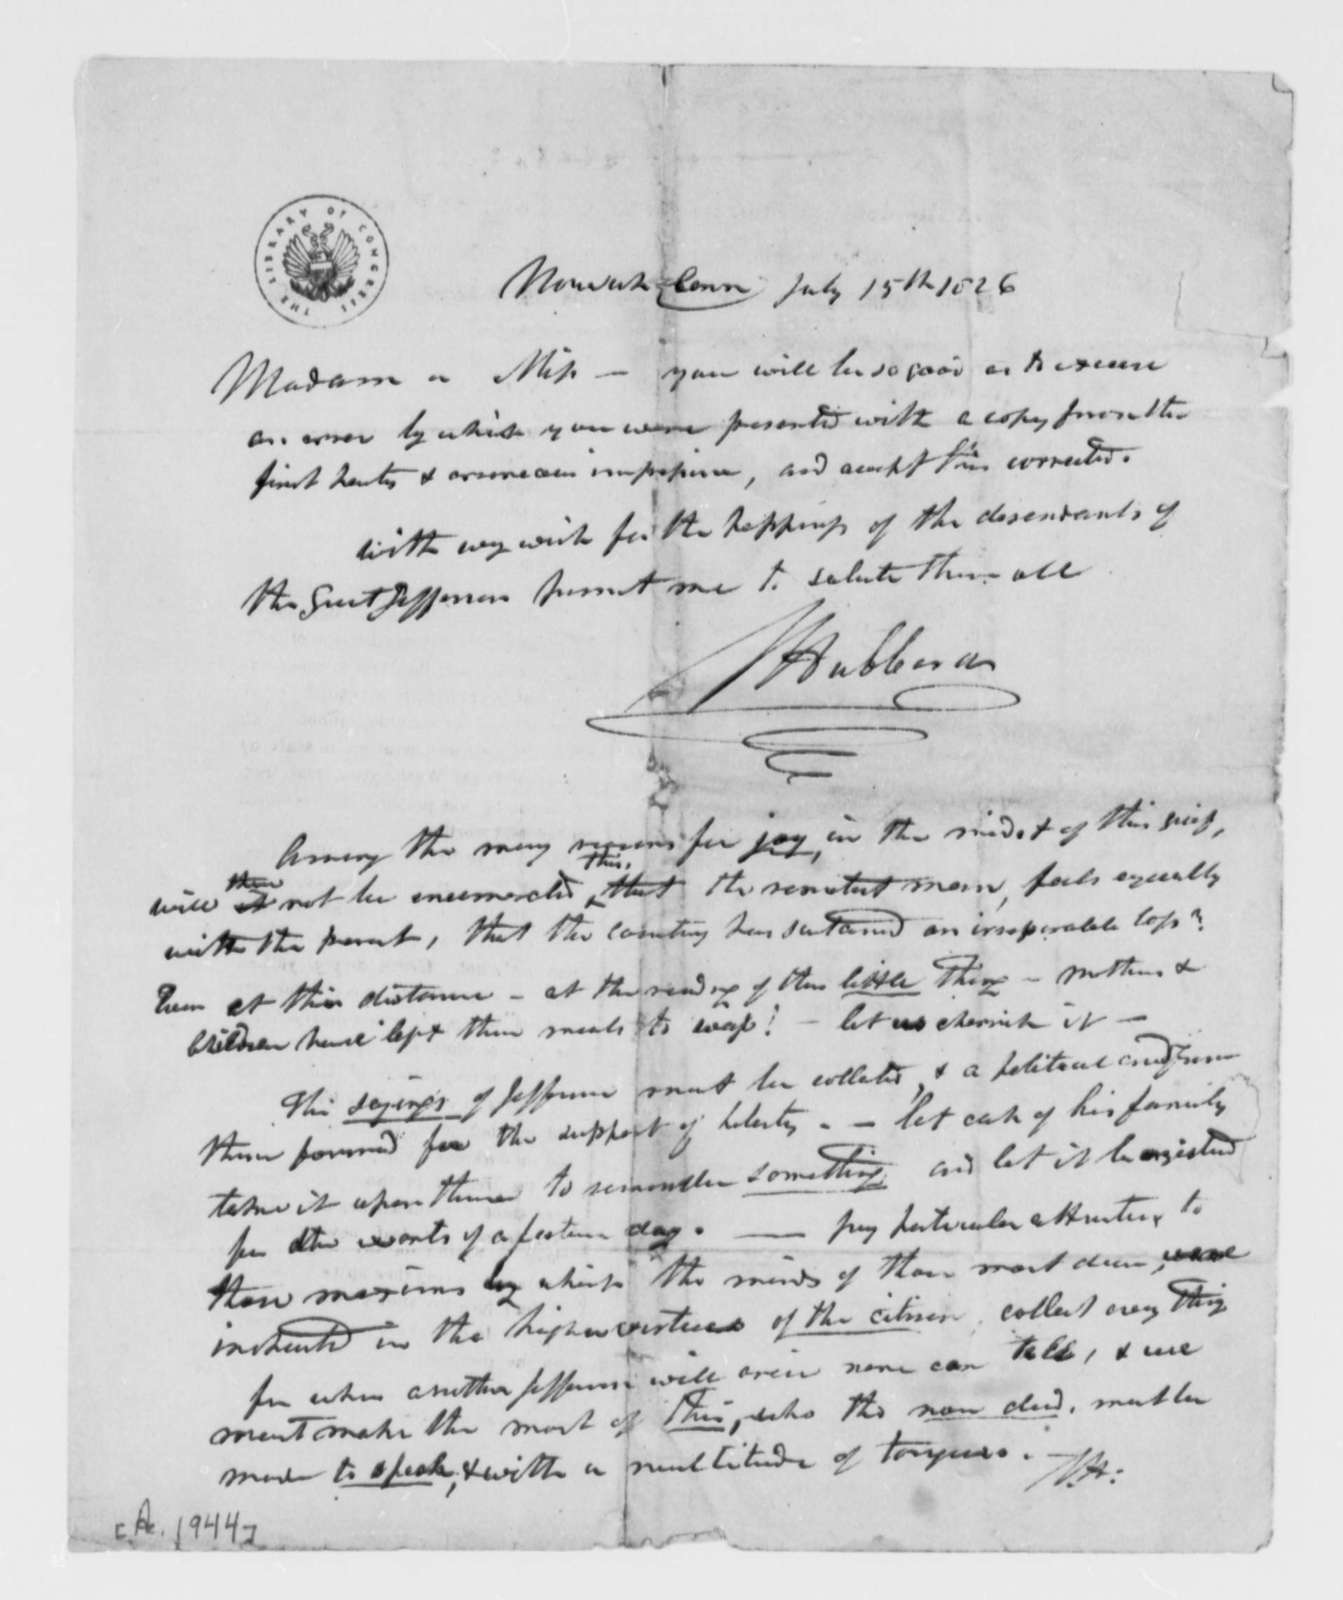 A. H. Hubbard to Martha Randolph, July 15, 1826